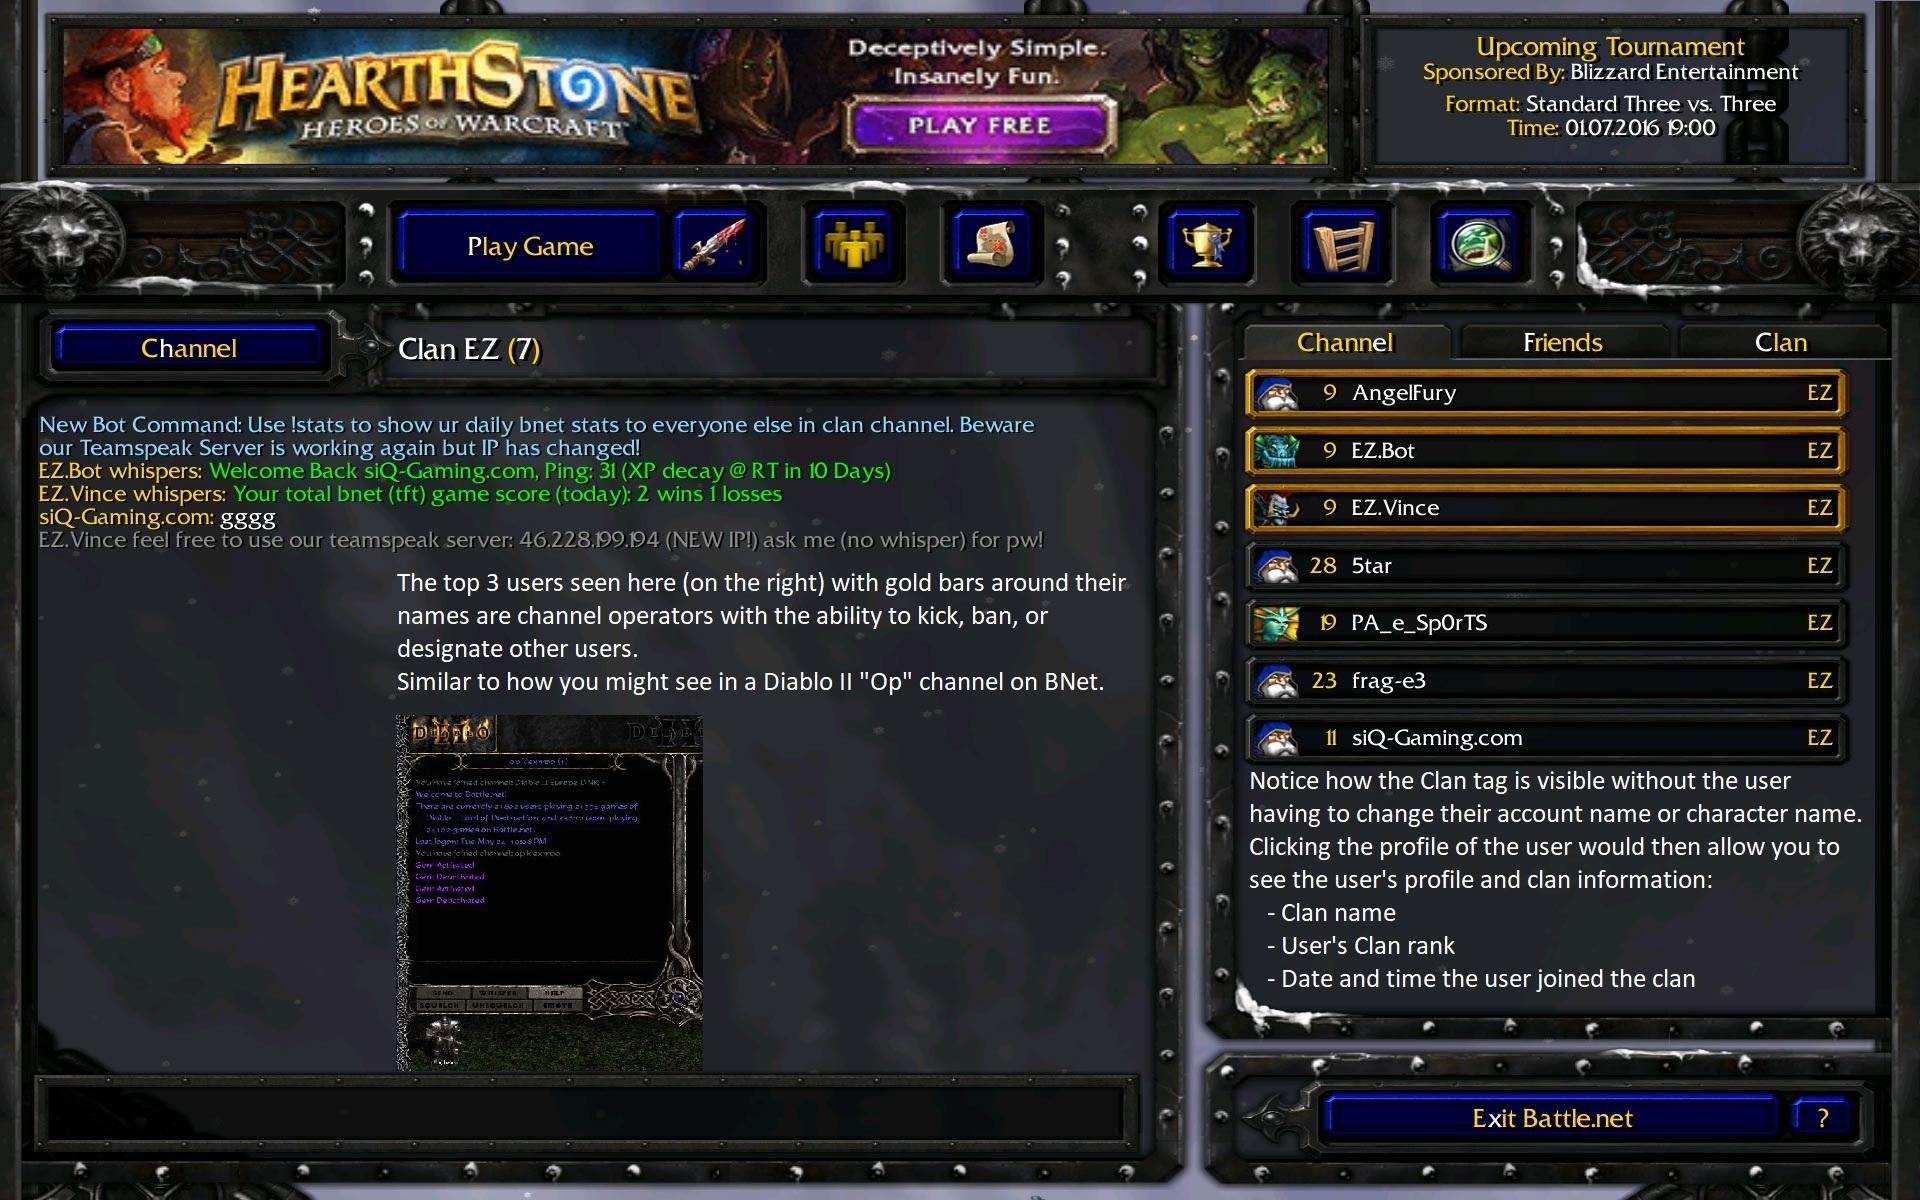 wc3 clan channel - D2R Clan Channels on Battle.net - Could help extend the prime of D2 [Idea Proposal]